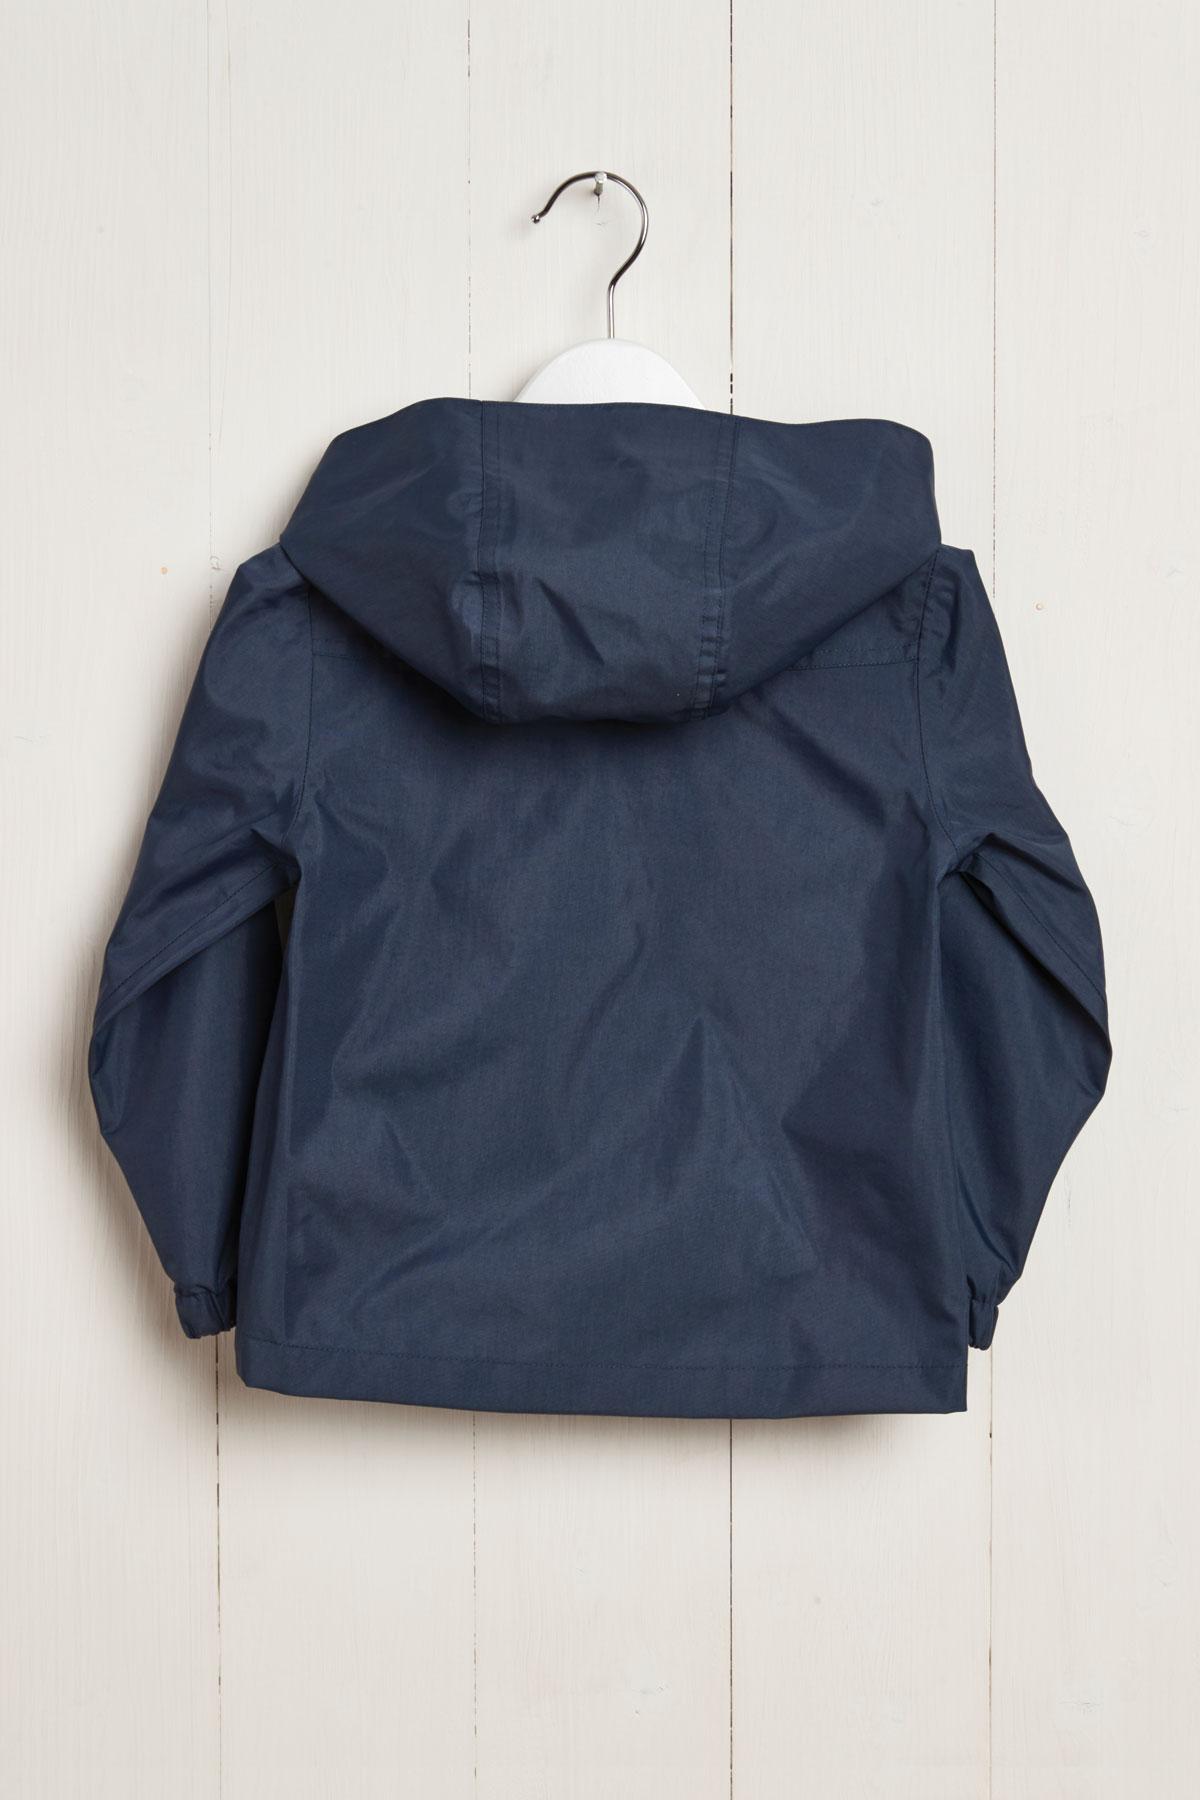 rear product hanger shot of kids navy rain jacket